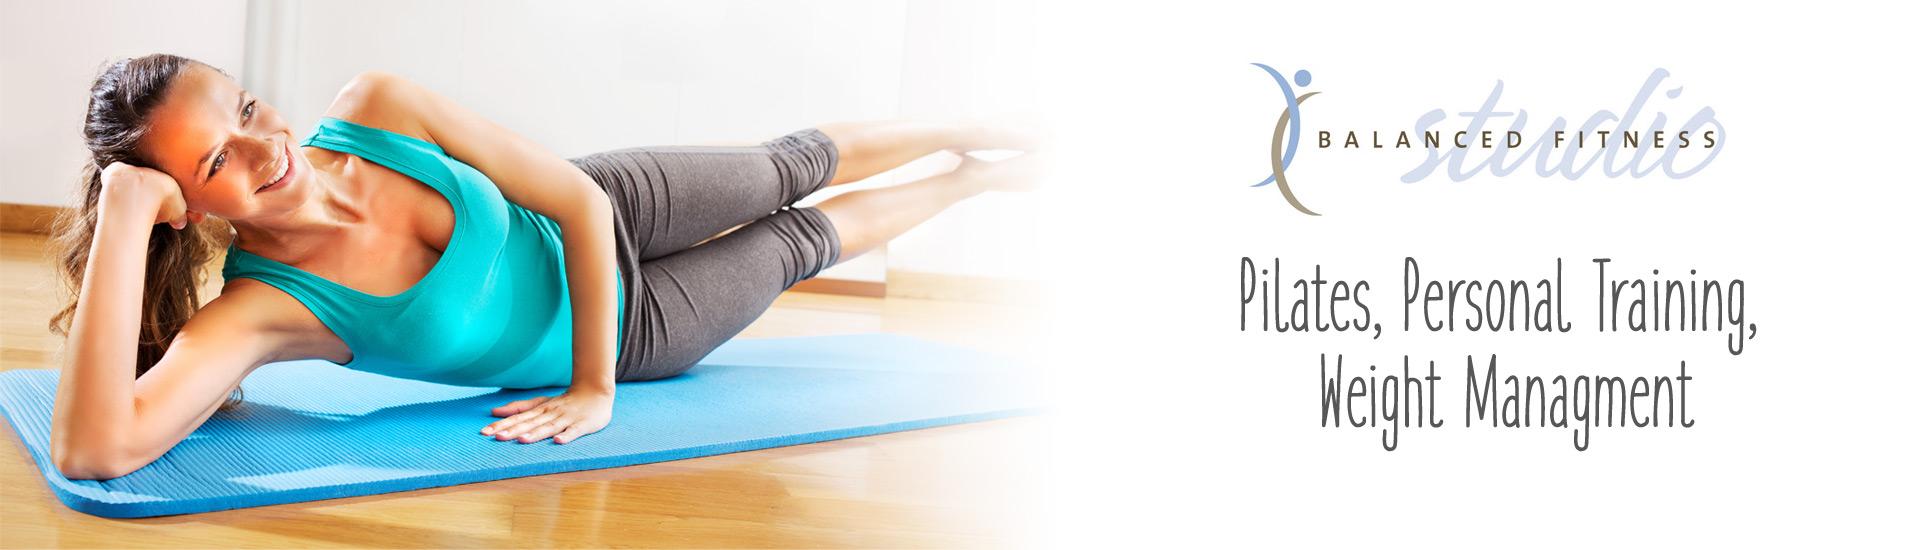 Surrey Pilates personal training weightloss